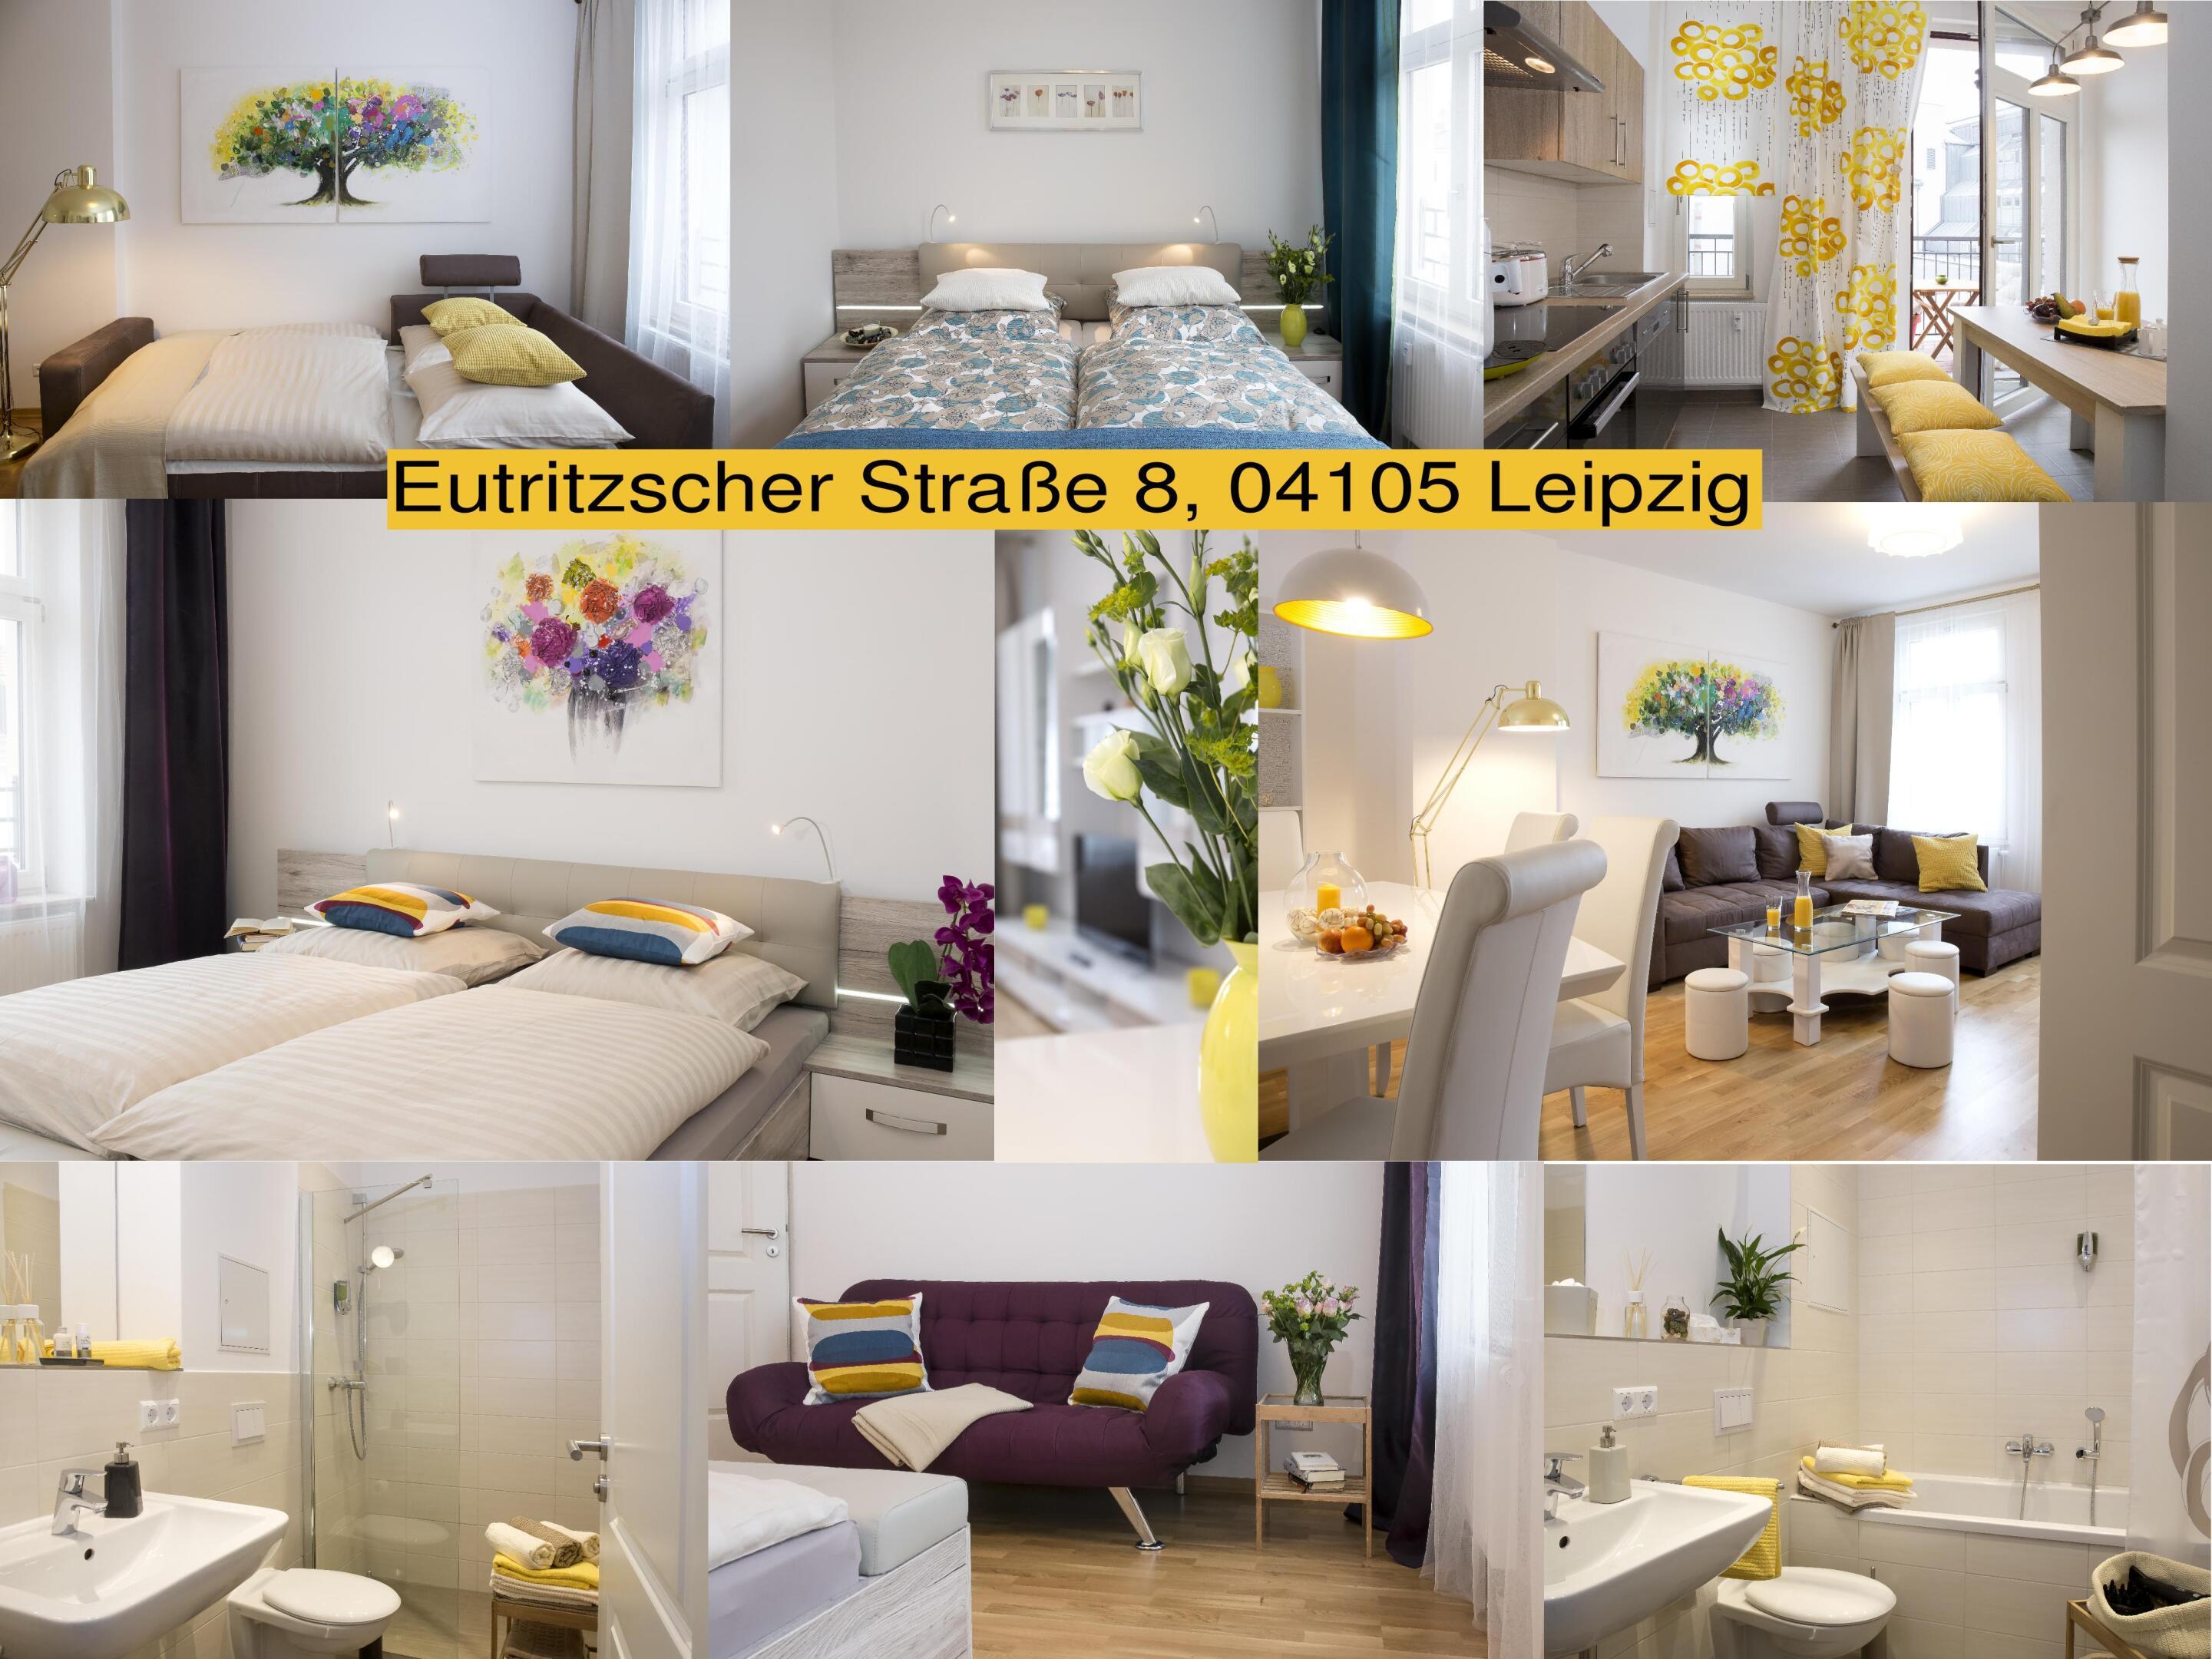 Apartment-Executive-Eigenes Badezimmer-Eutritzscher Straße 8 - Basistarif